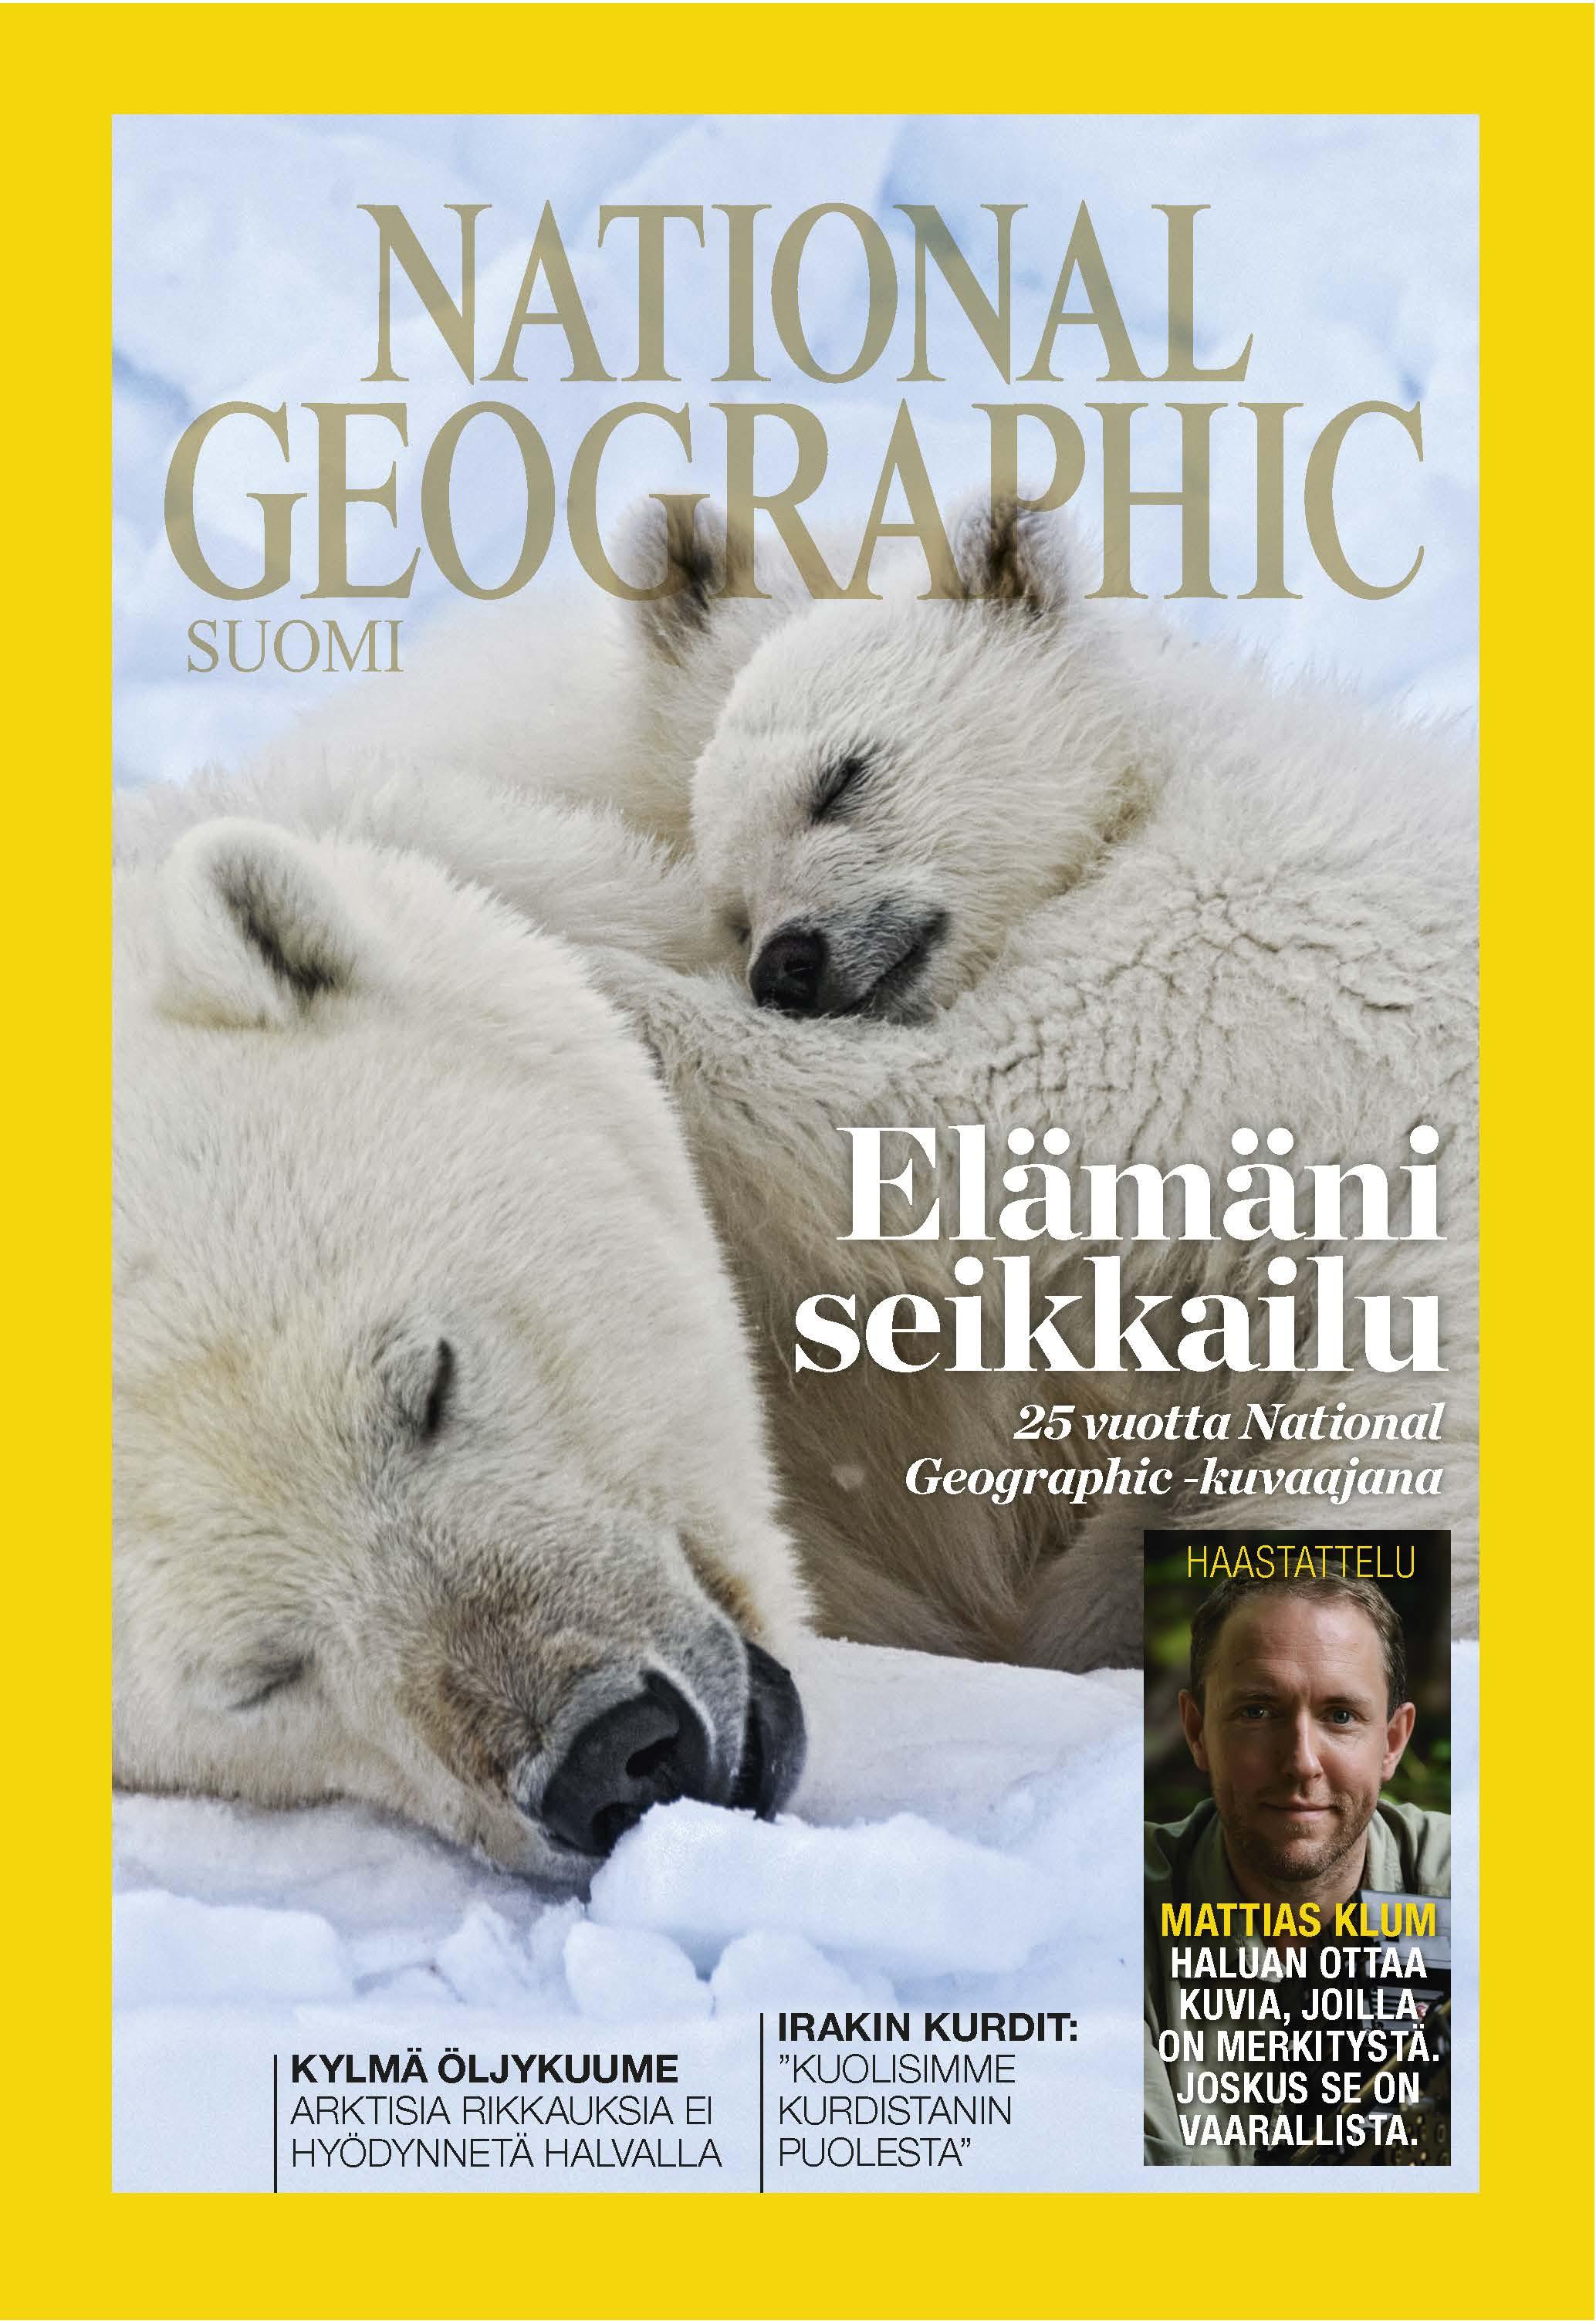 0316 FI COVER.jpg